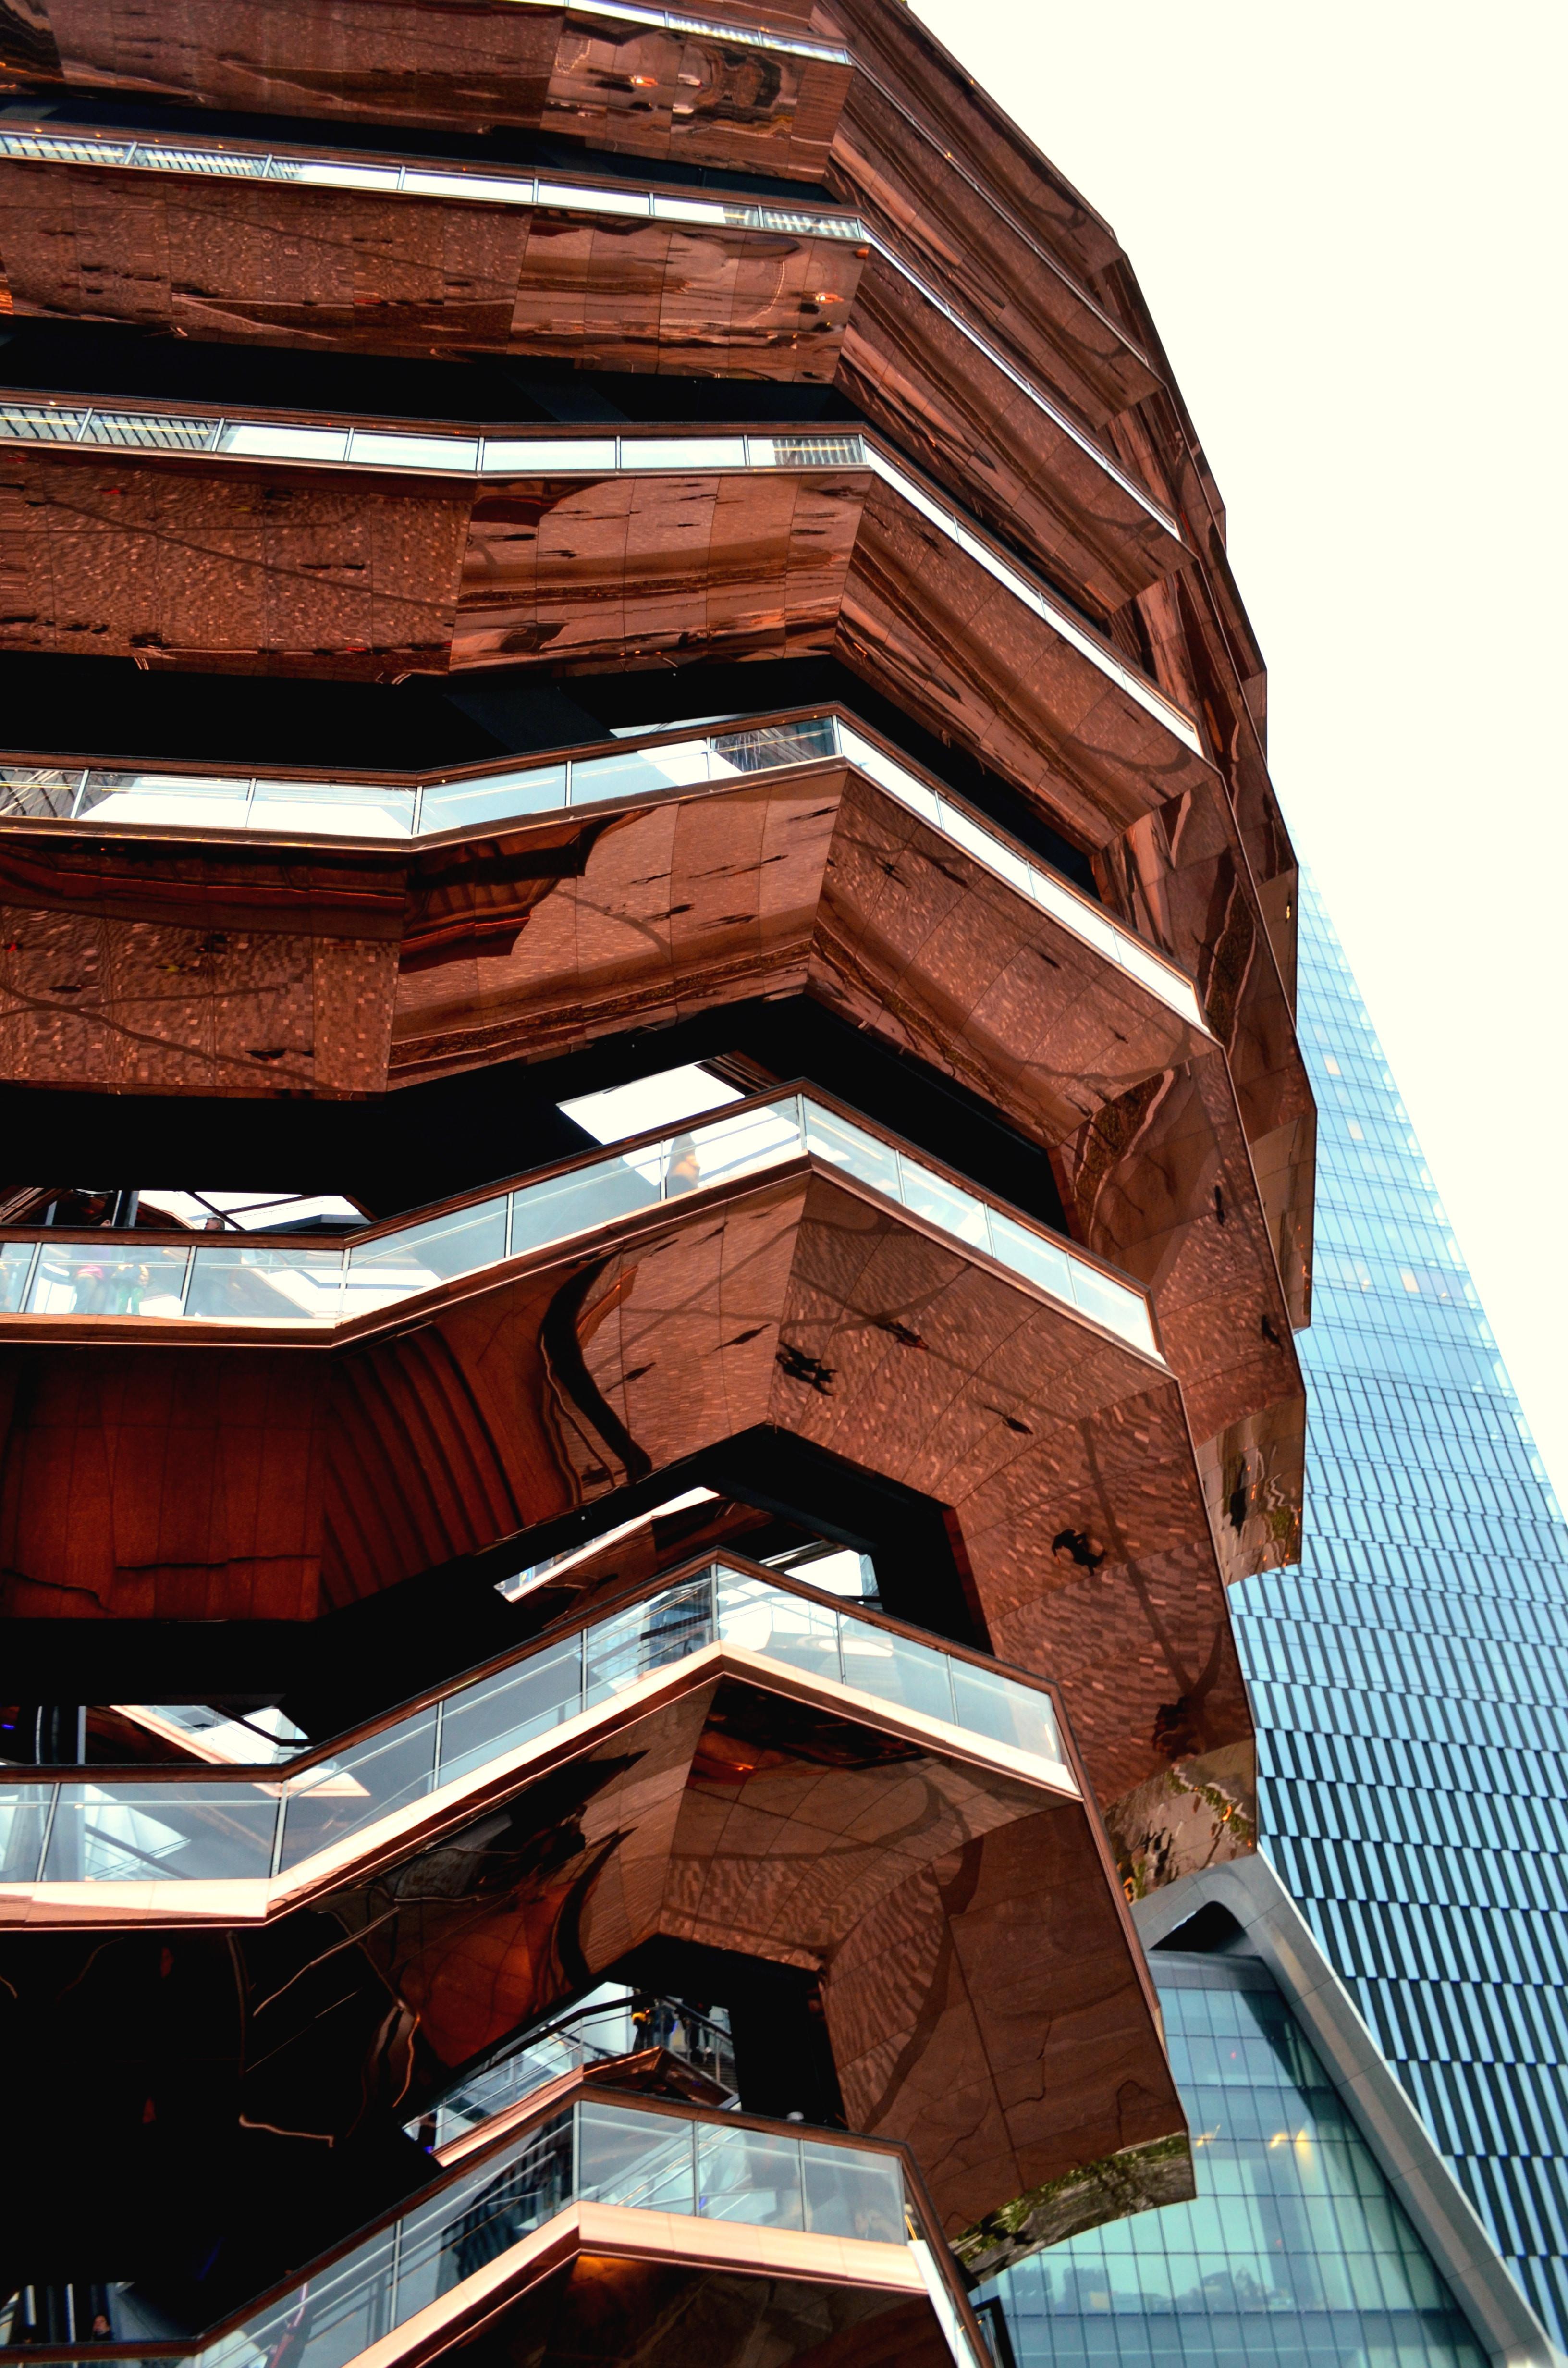 Midtown Hudson Yards, The Vessel & more